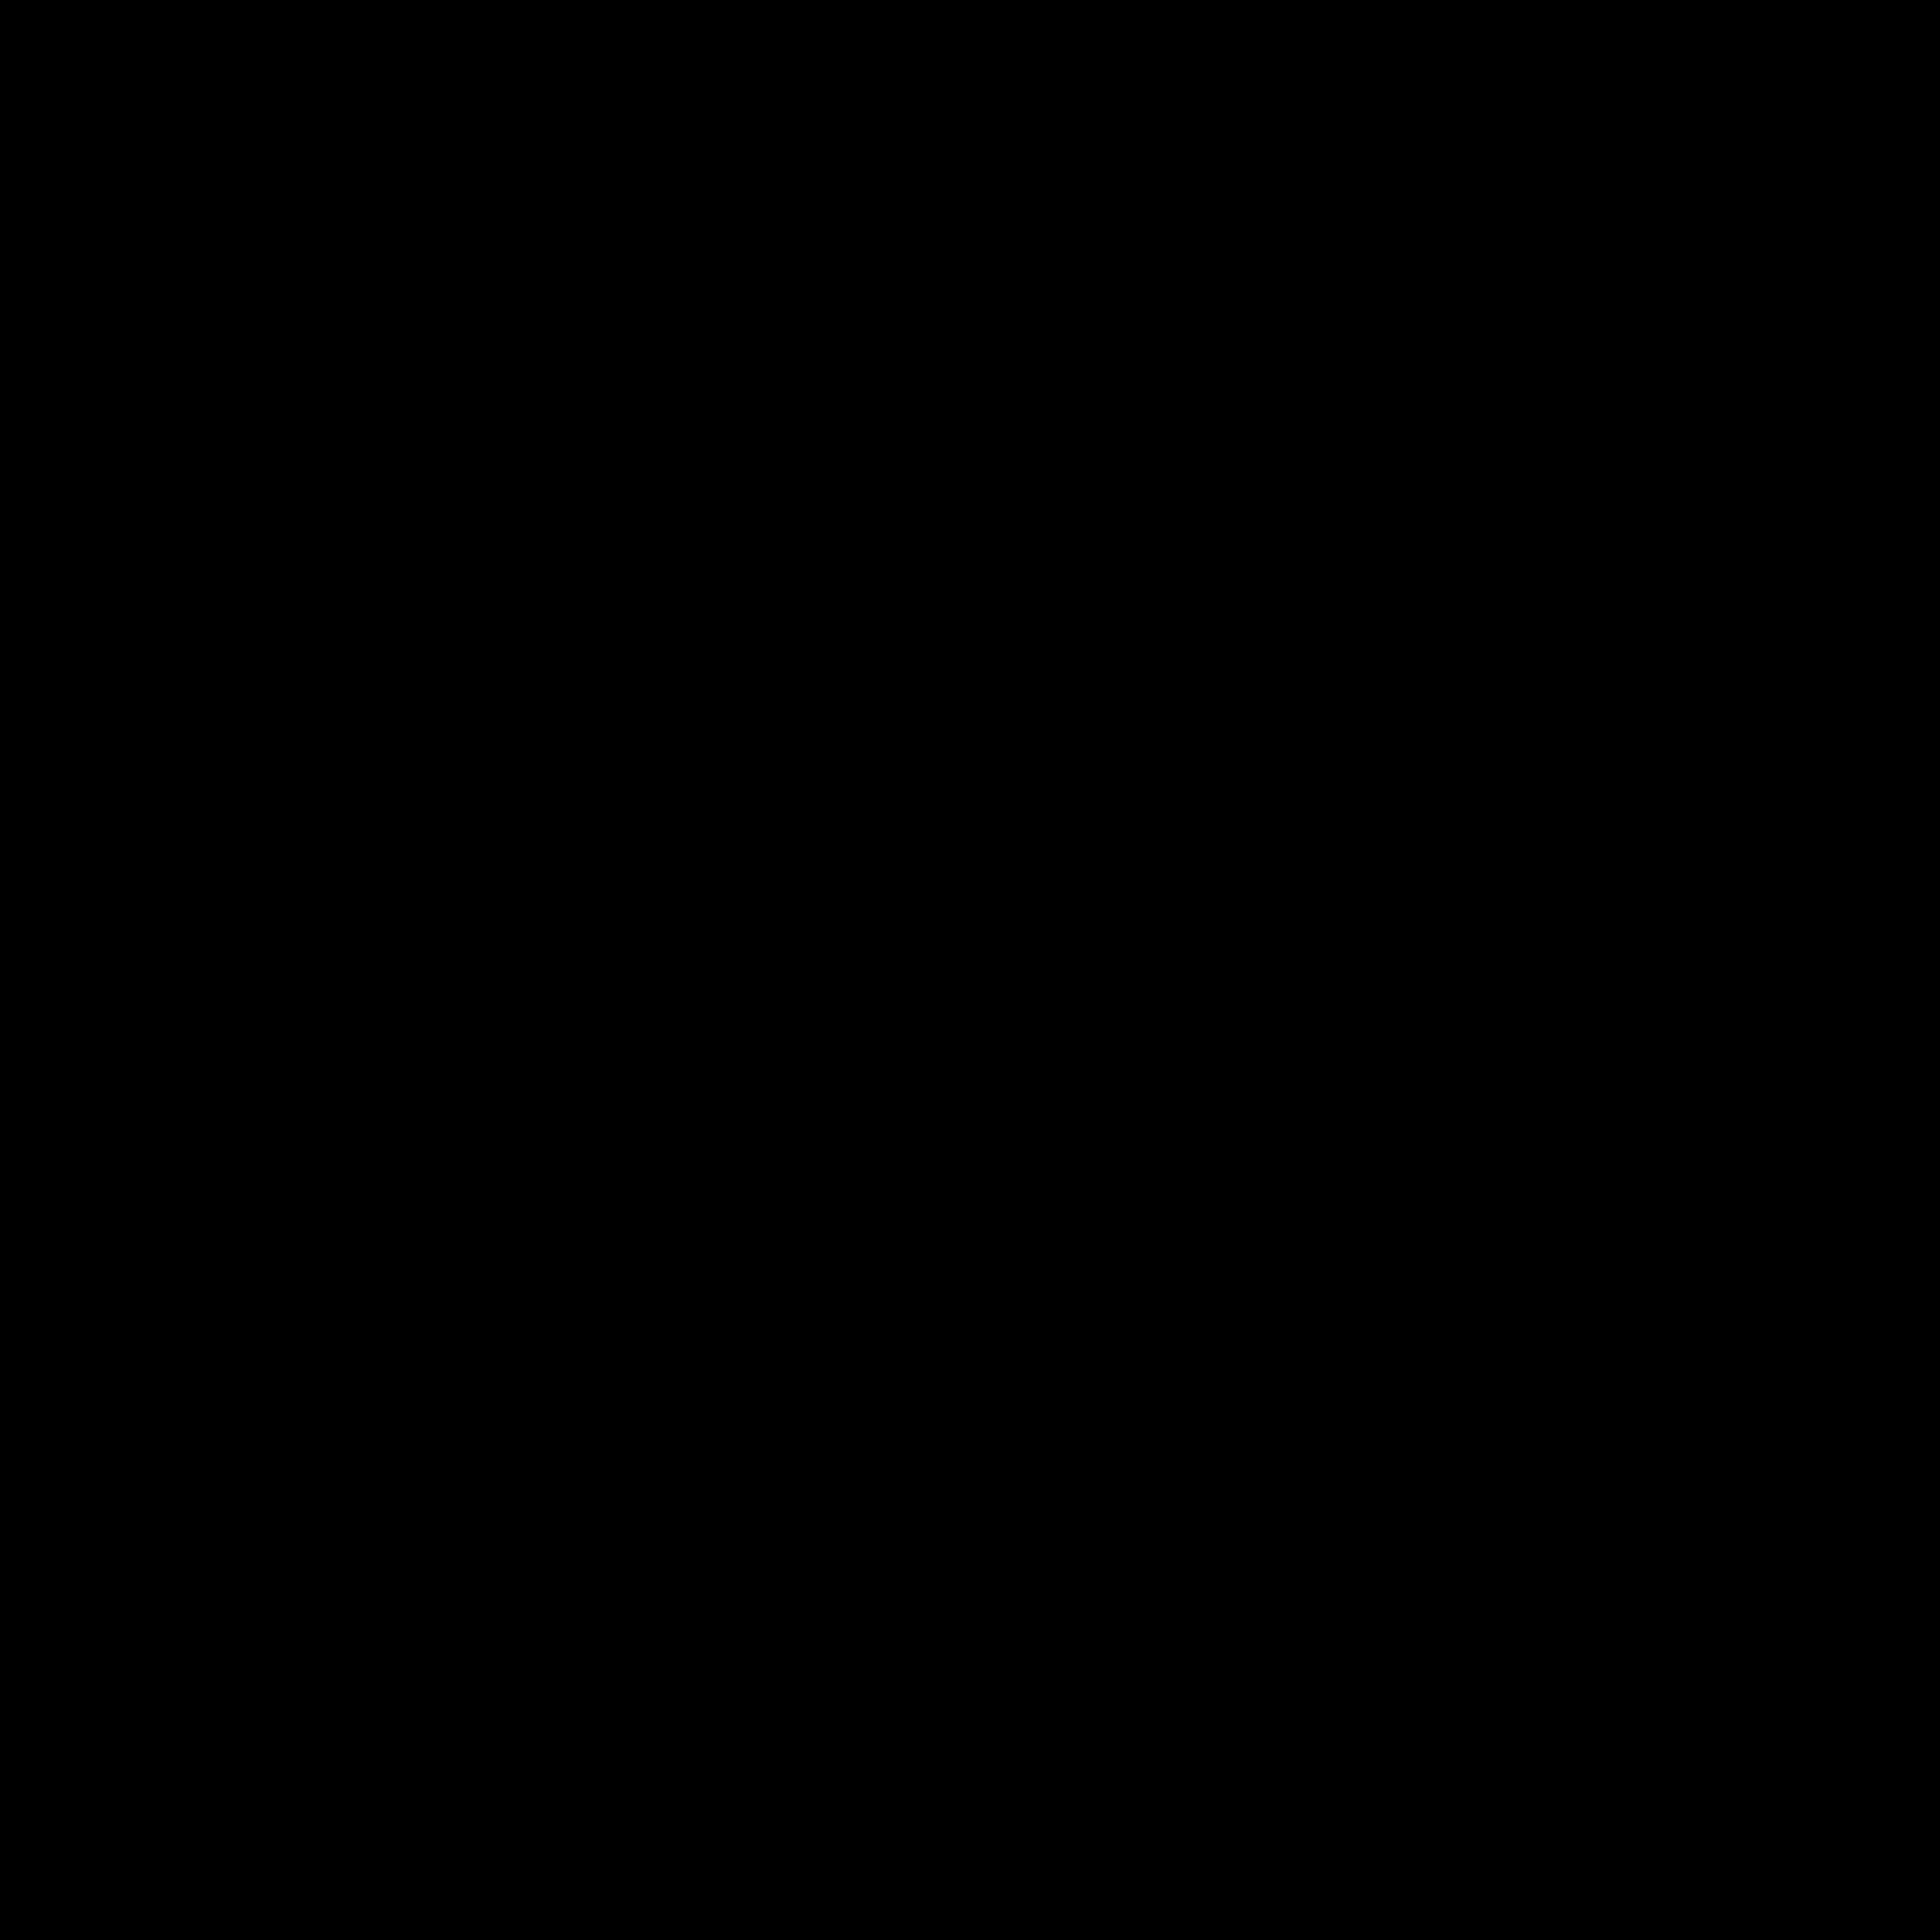 Champions League Logo Png